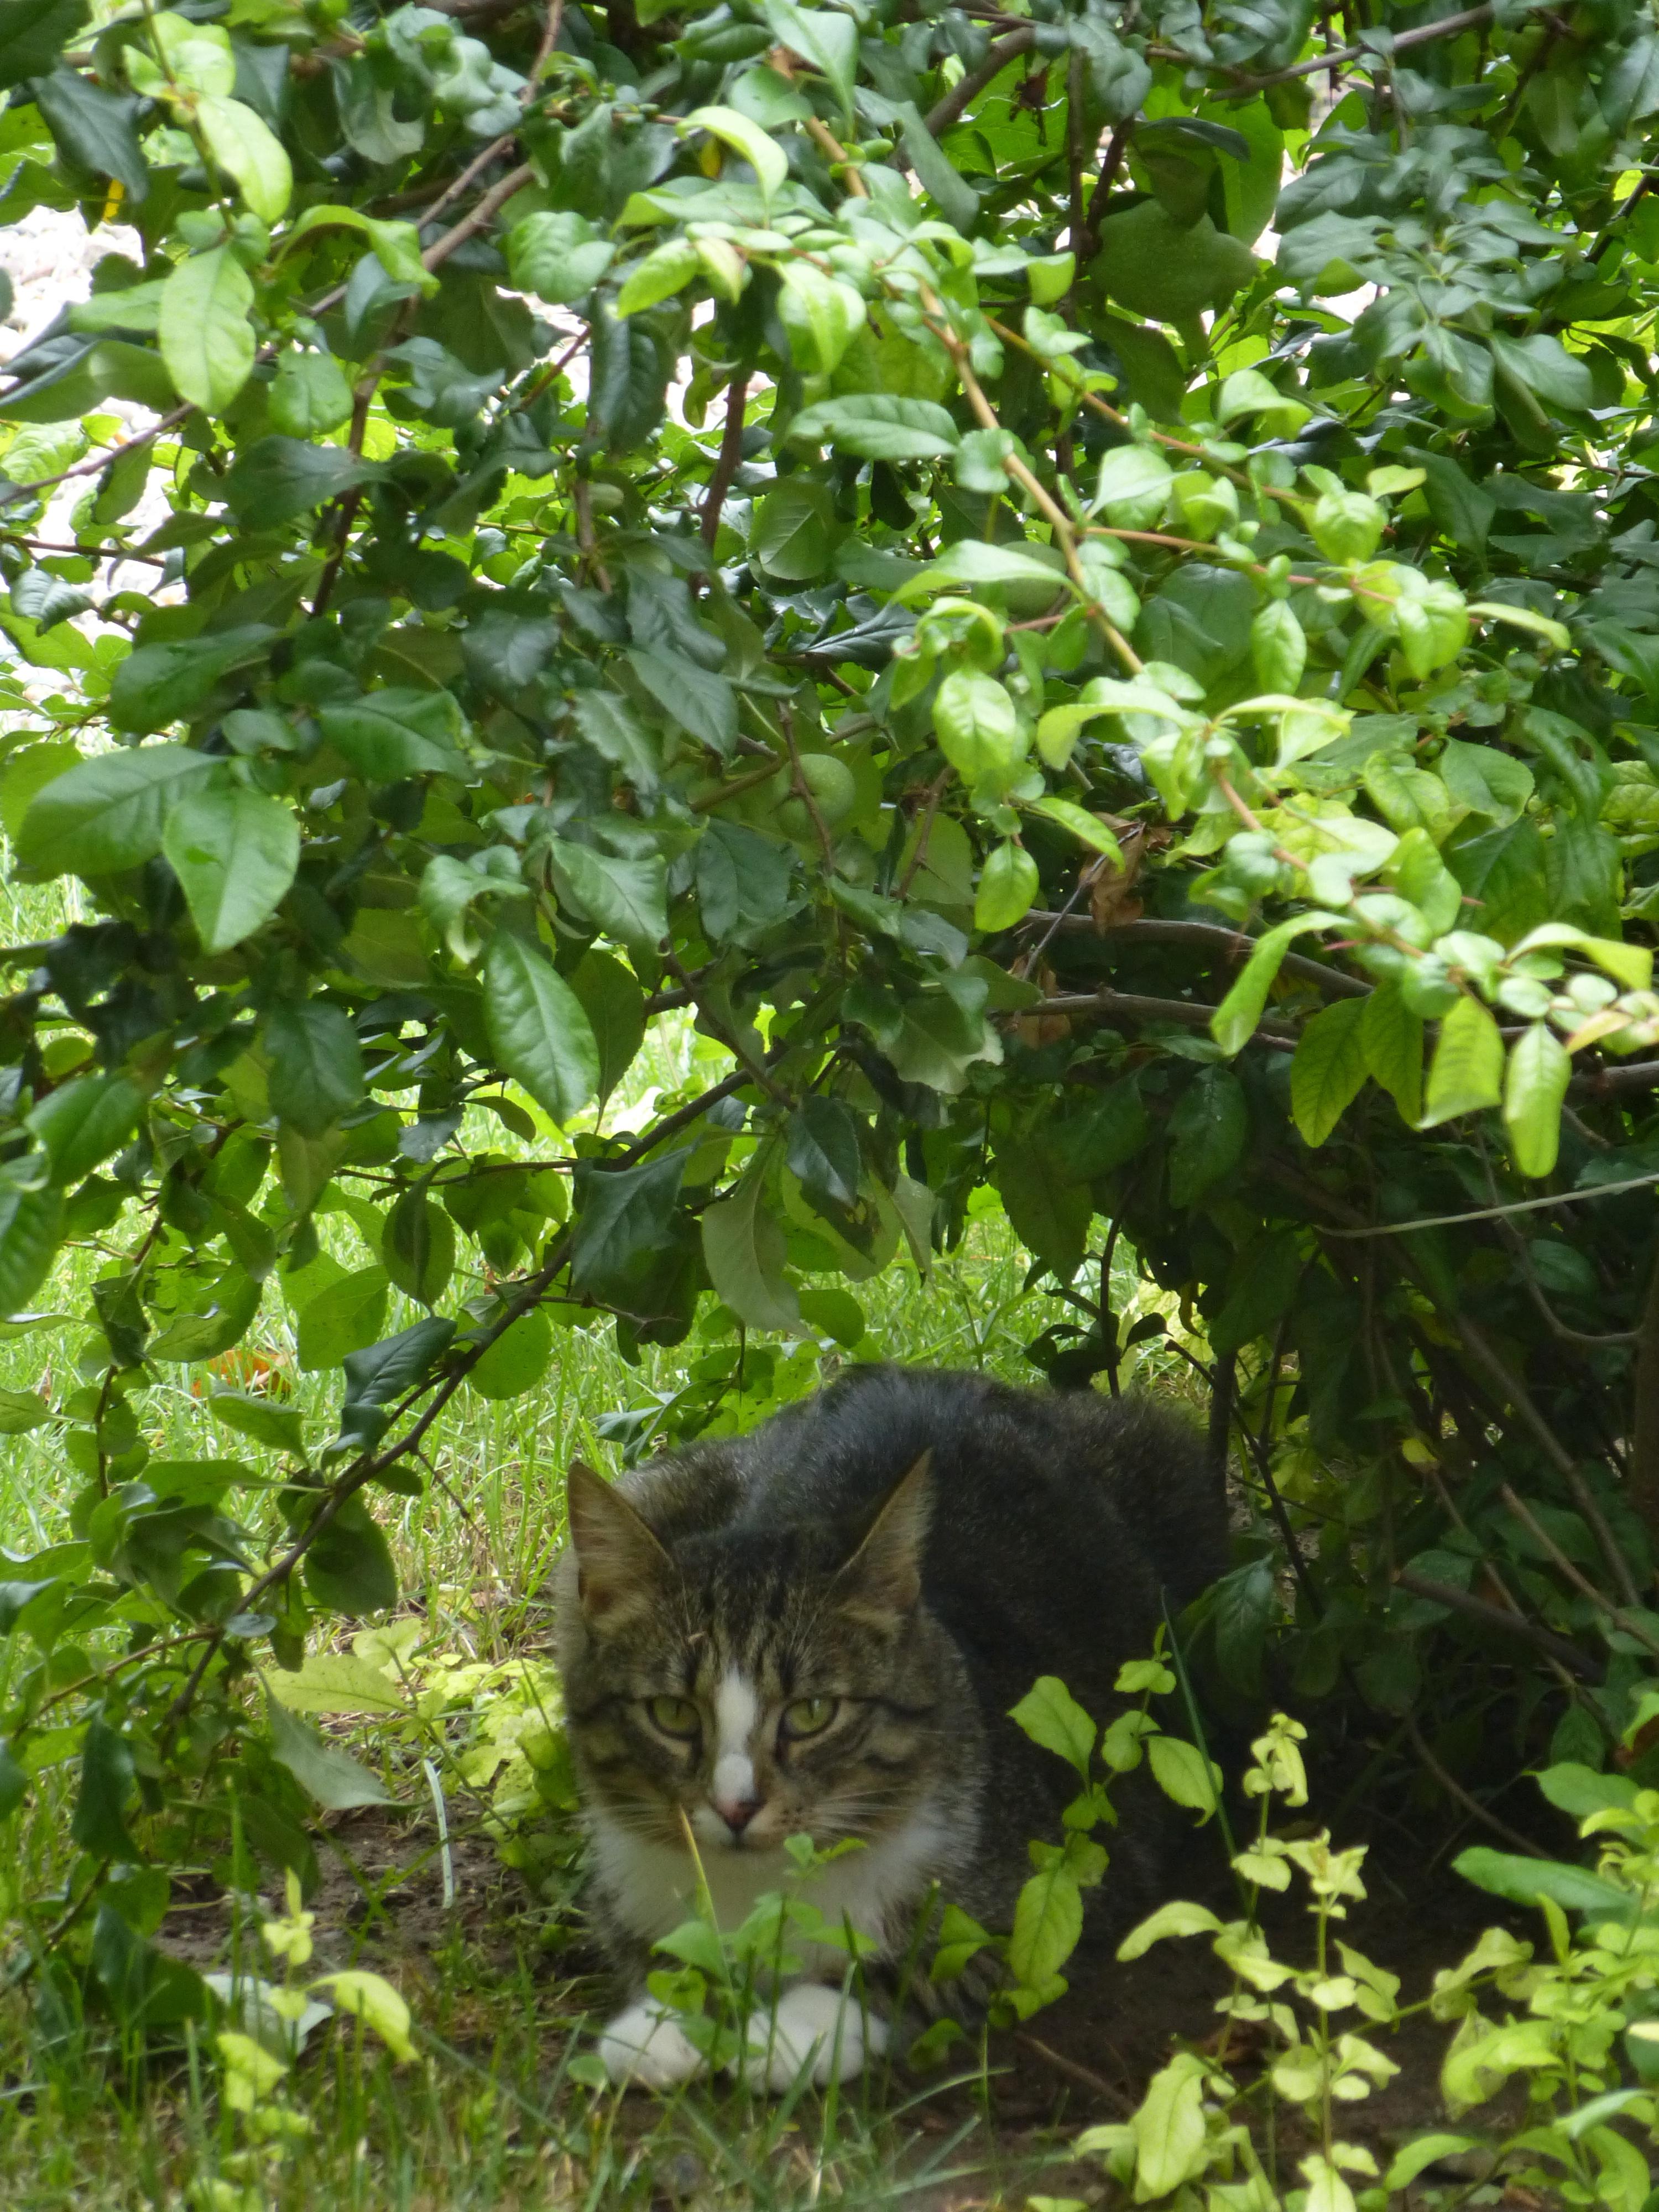 Find the cat 2